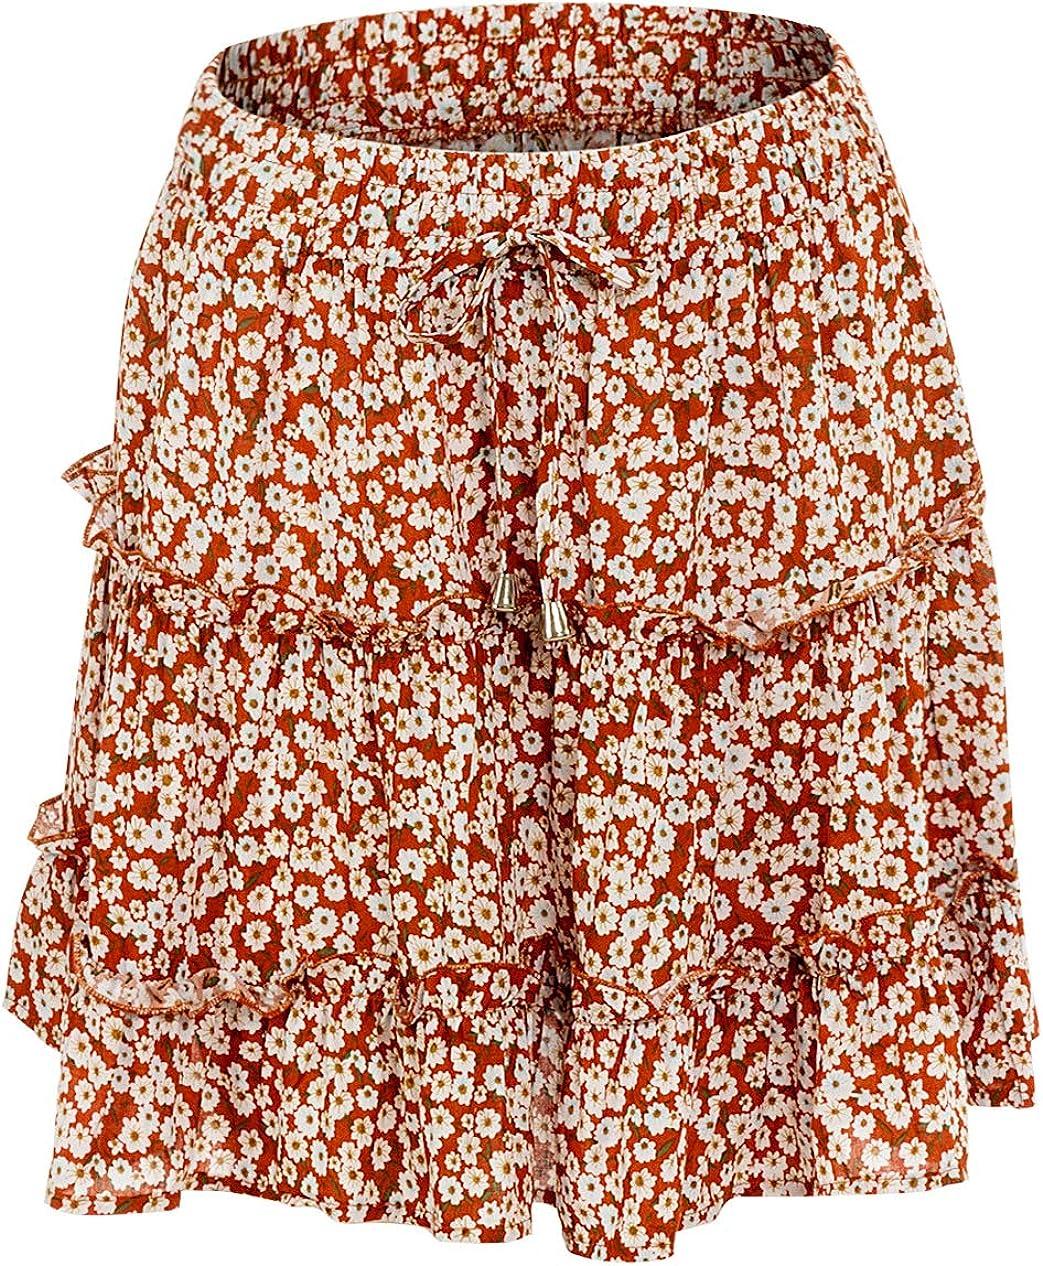 Springrain Women's Casual Elastic Waist Floral Print A Line Ruffle Pleated Mini Skirt